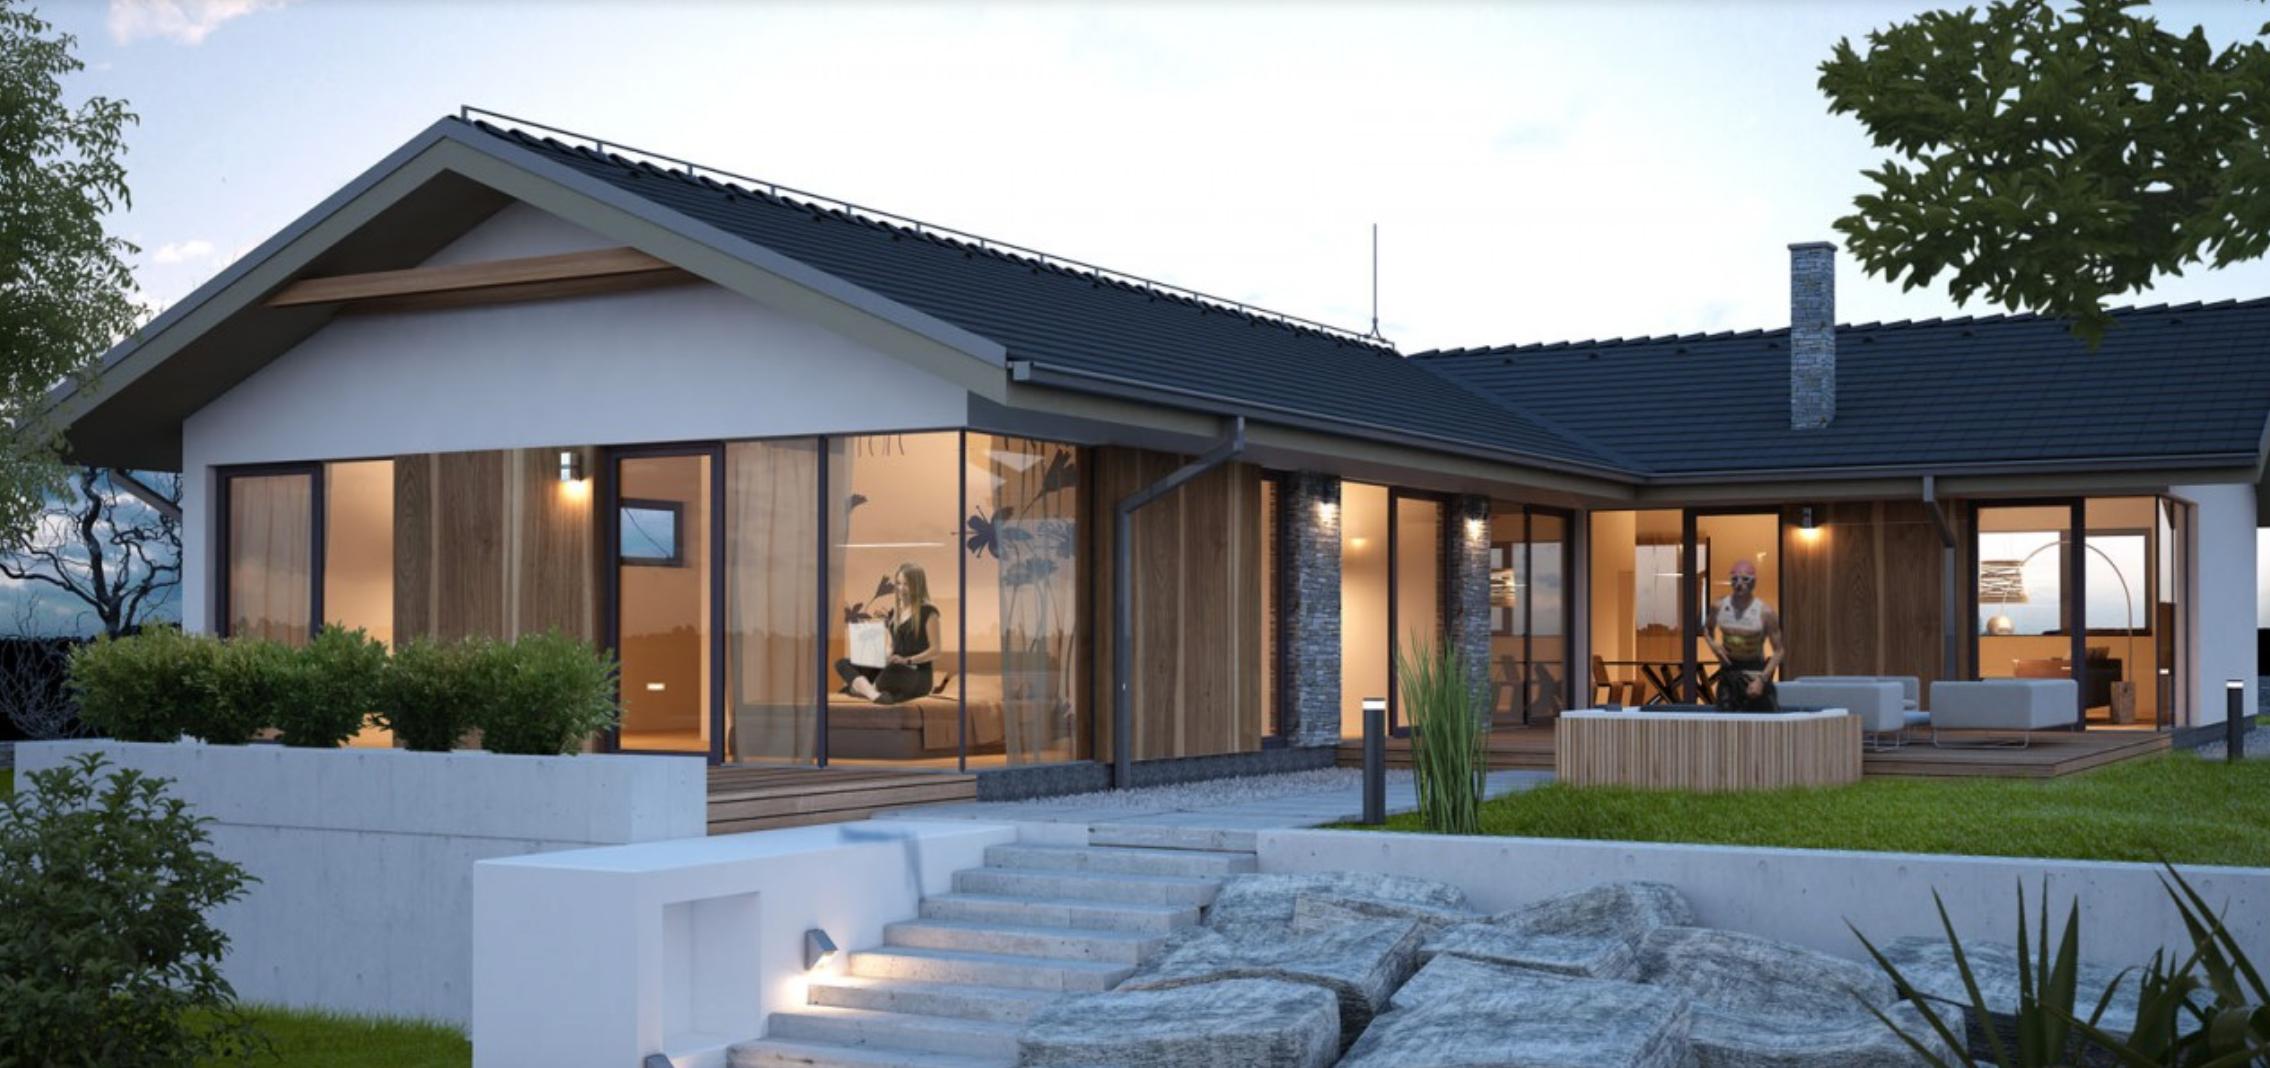 Ponuka Projektov Domov Keramické Montované Domy Anvik